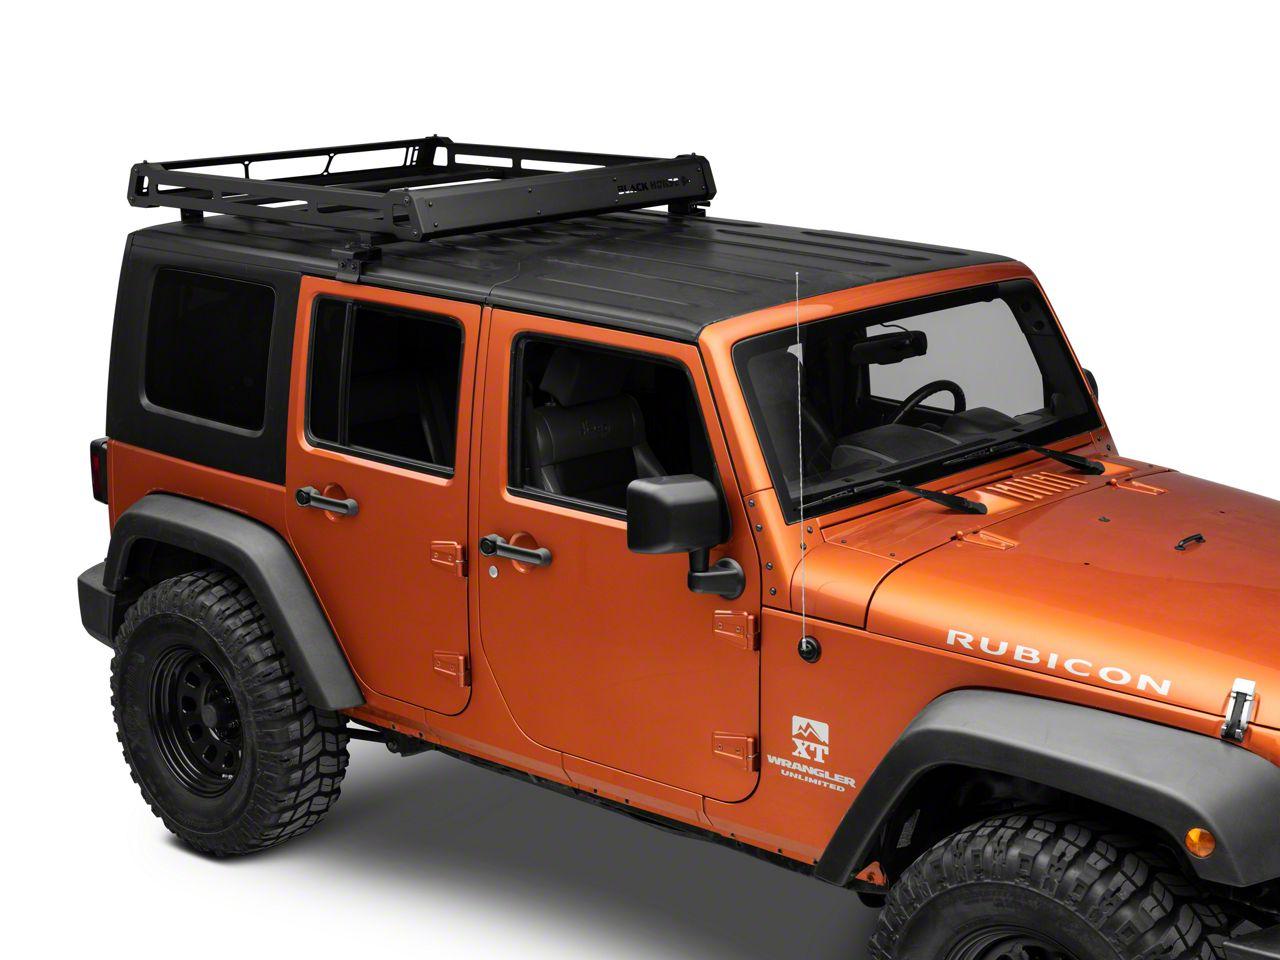 Jeep Wrangler No Drill Rooftop Rack 07 18 Jeep Wrangler Jk